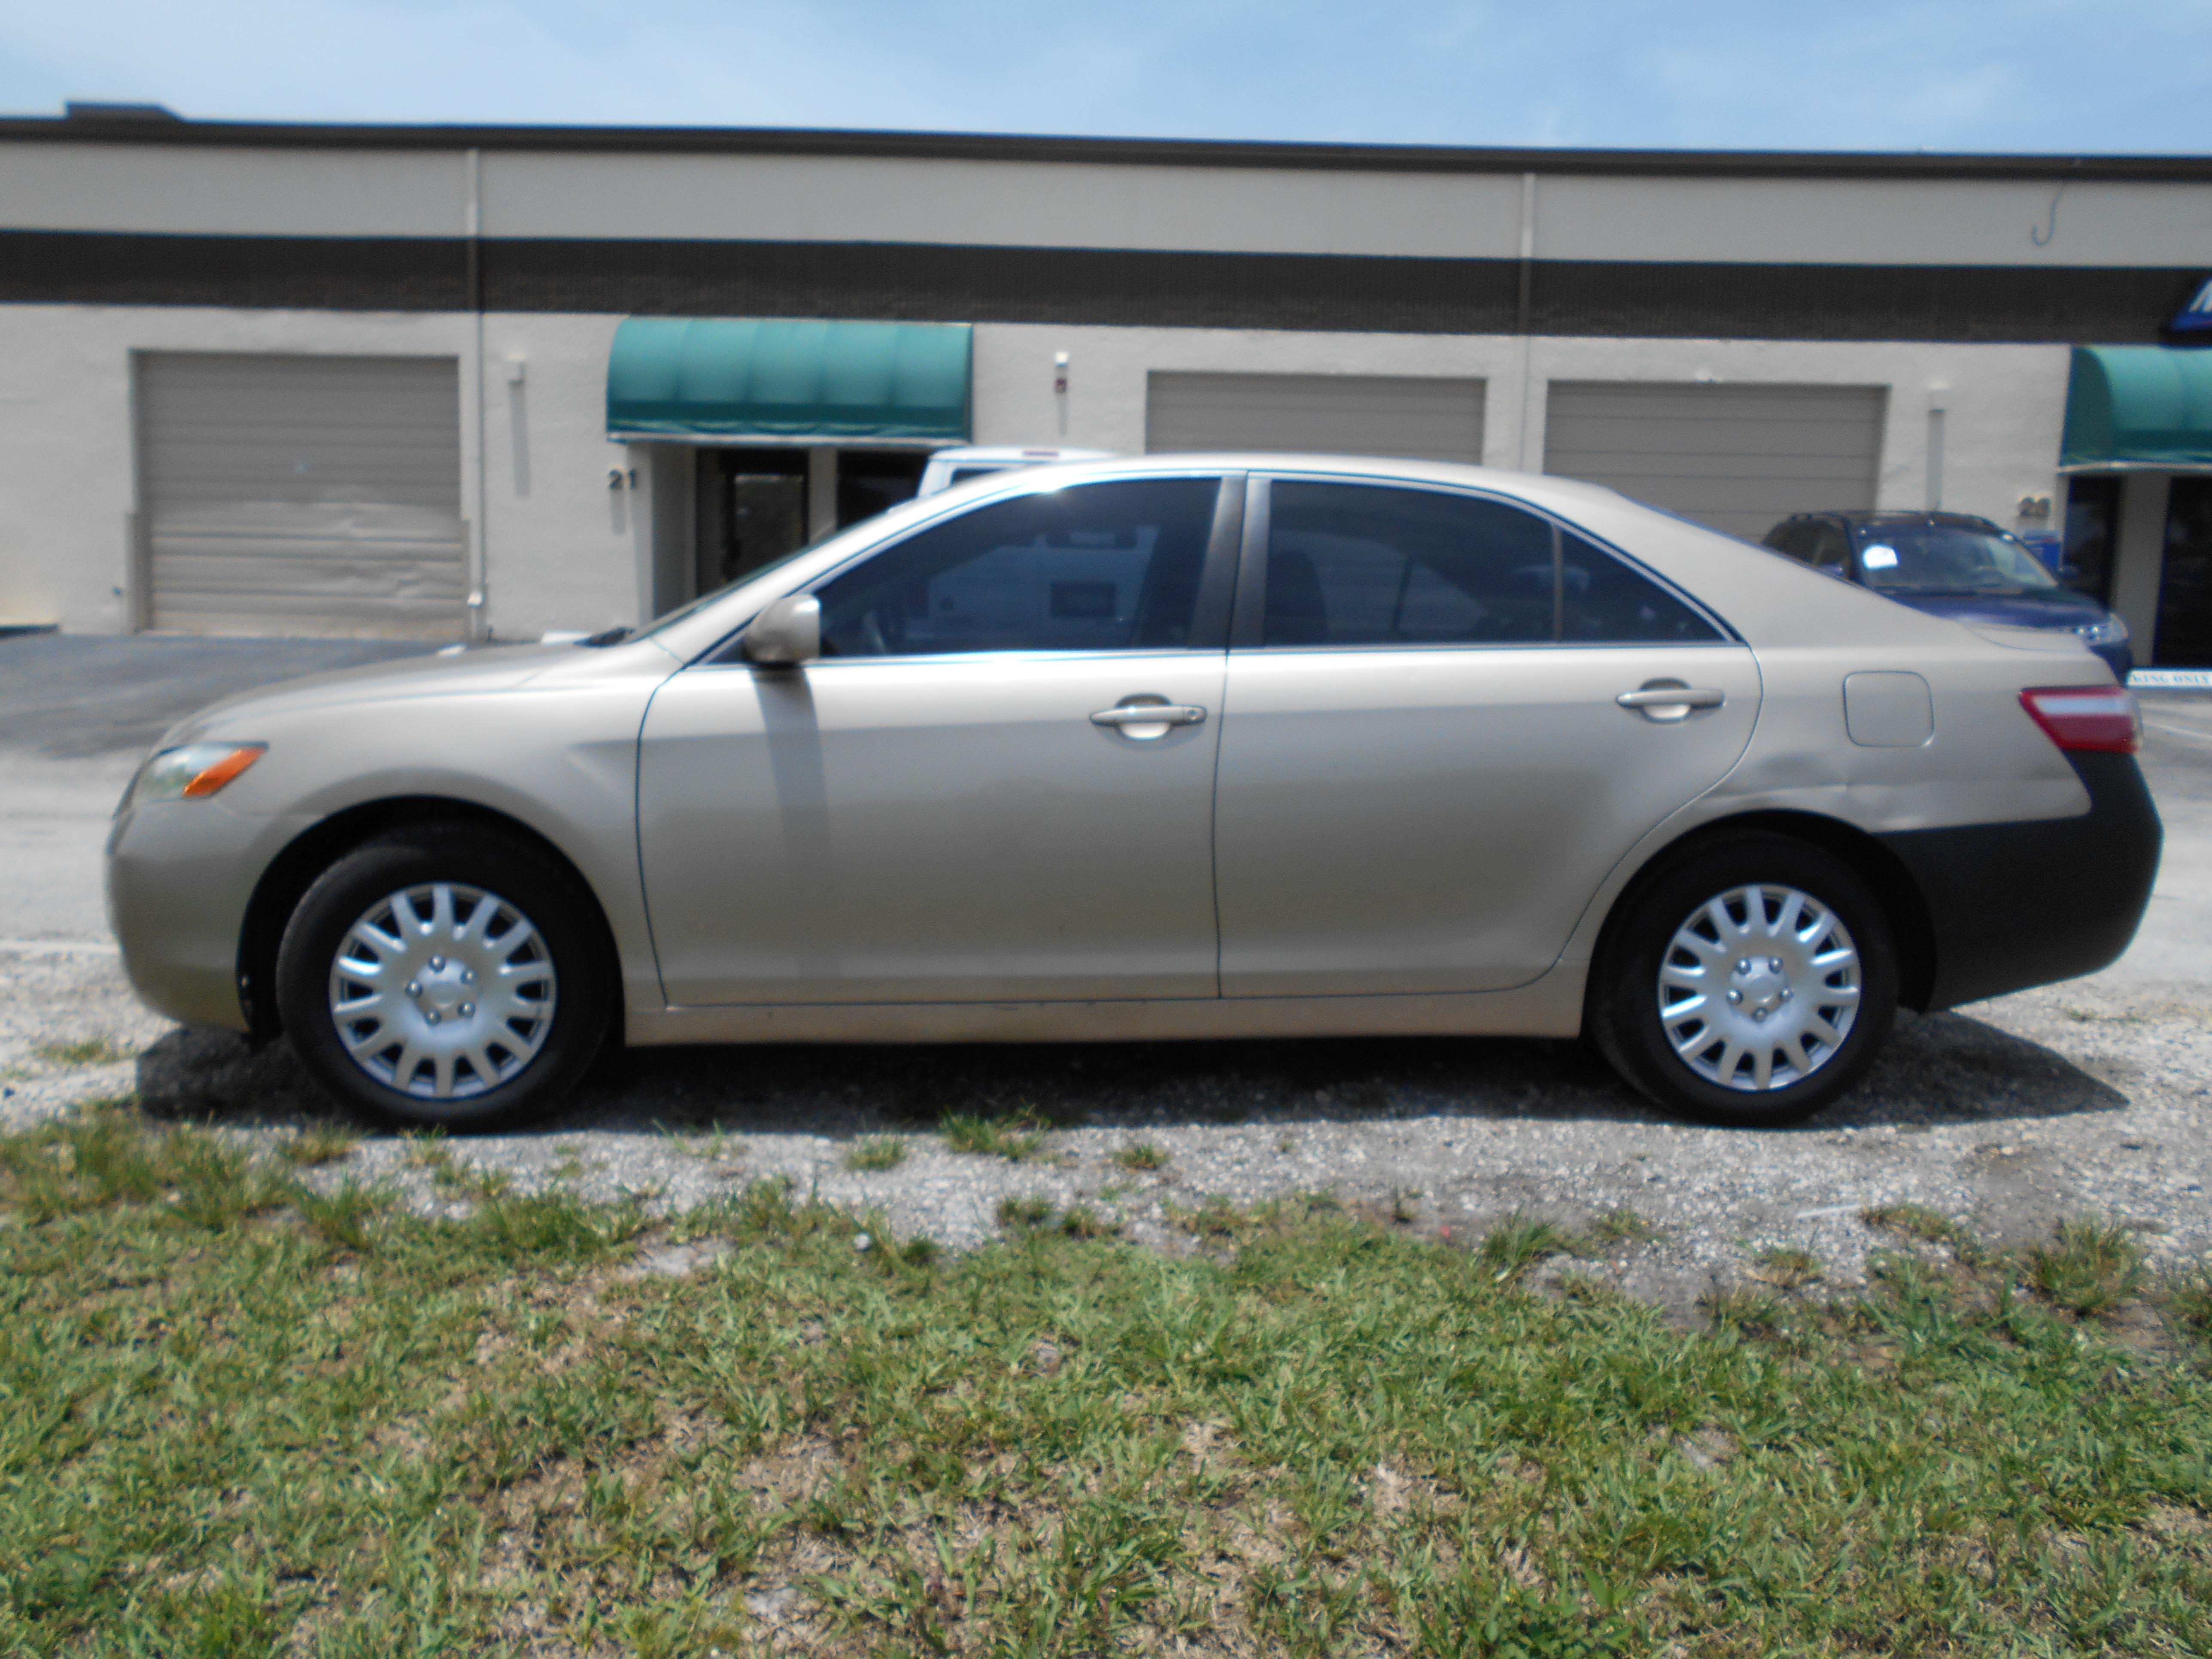 Chevrolet Of Spartanburg >> Maaco Collision Repair Auto Painting 10 Photos Body | Autos Post